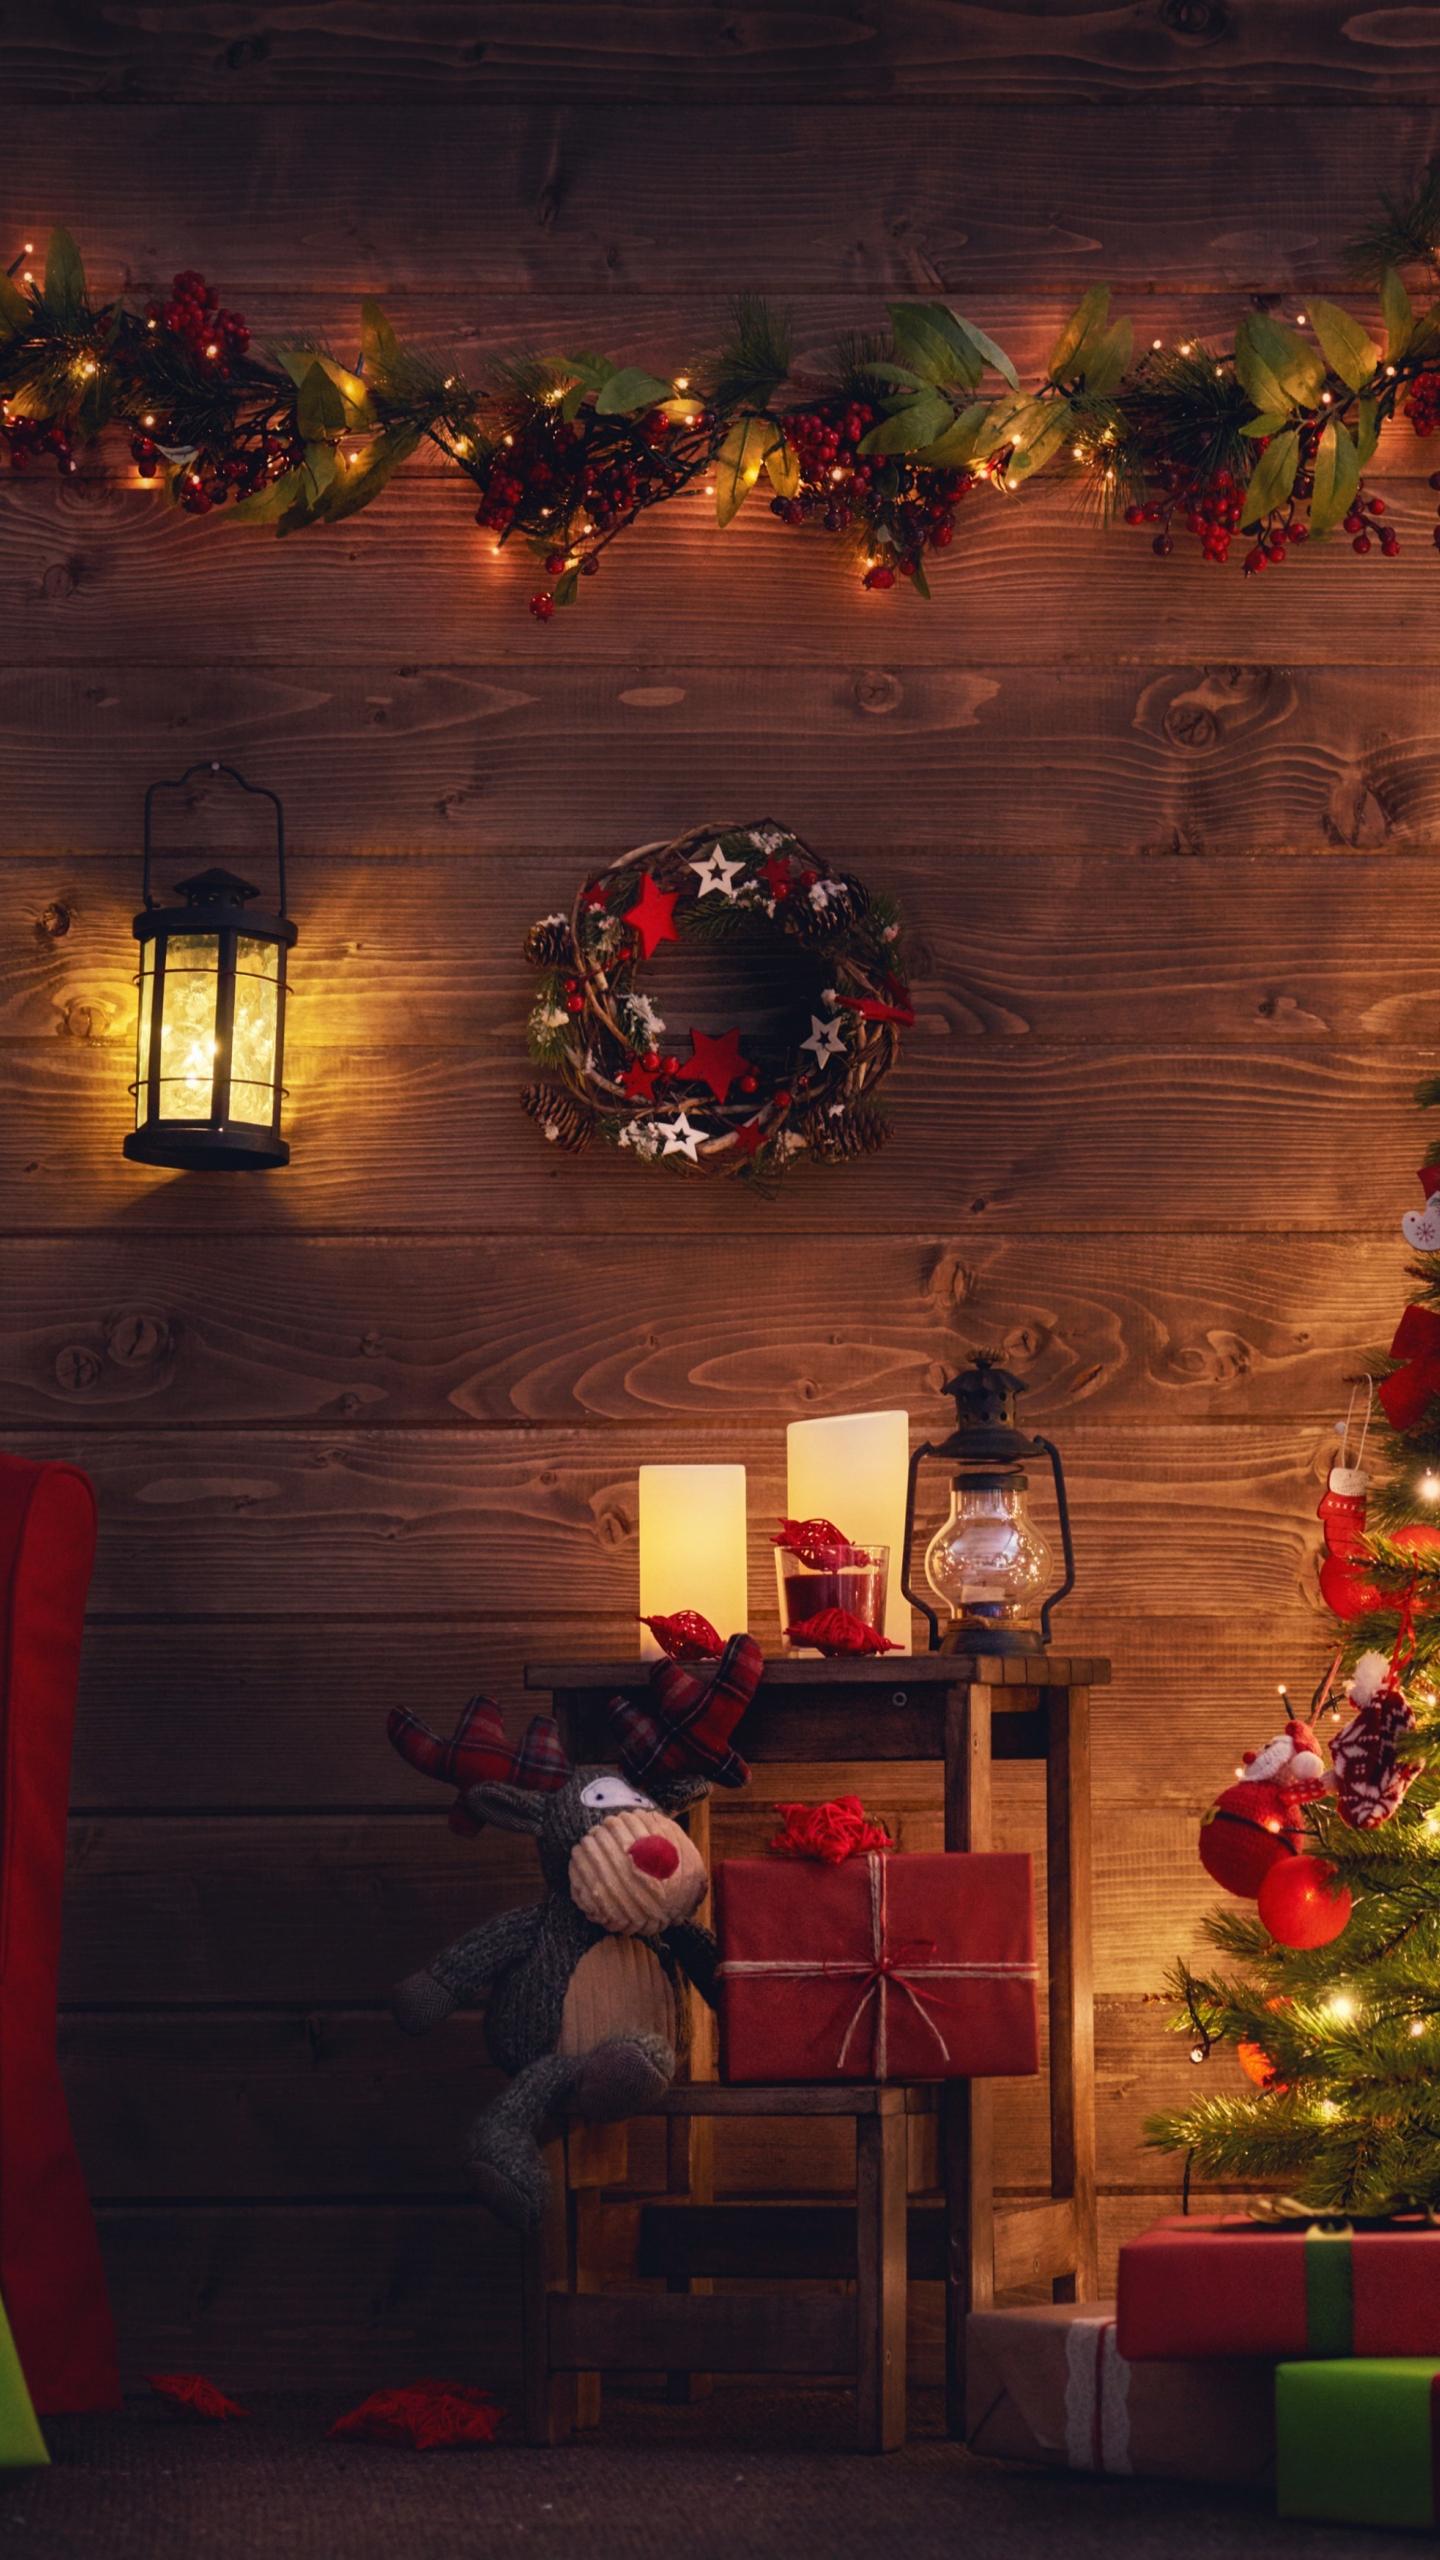 Download 1440x2560 Wallpaper Christmas Tree Holiday